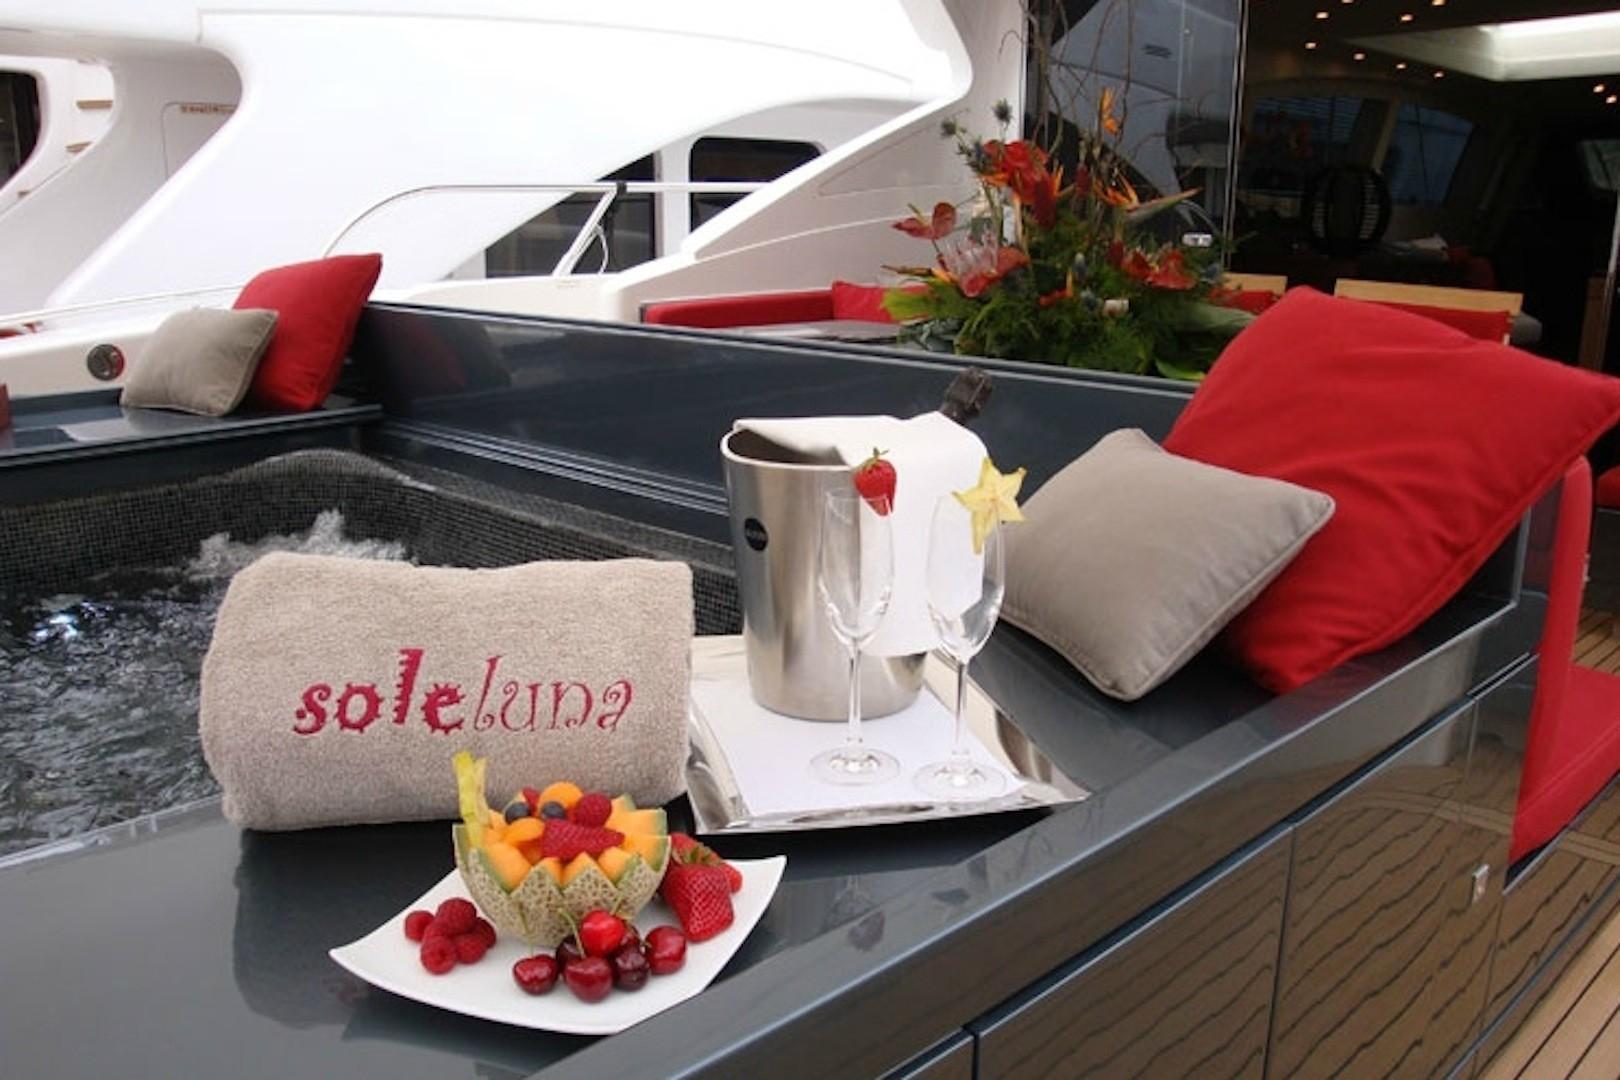 The 28m Yacht SOLELUNA